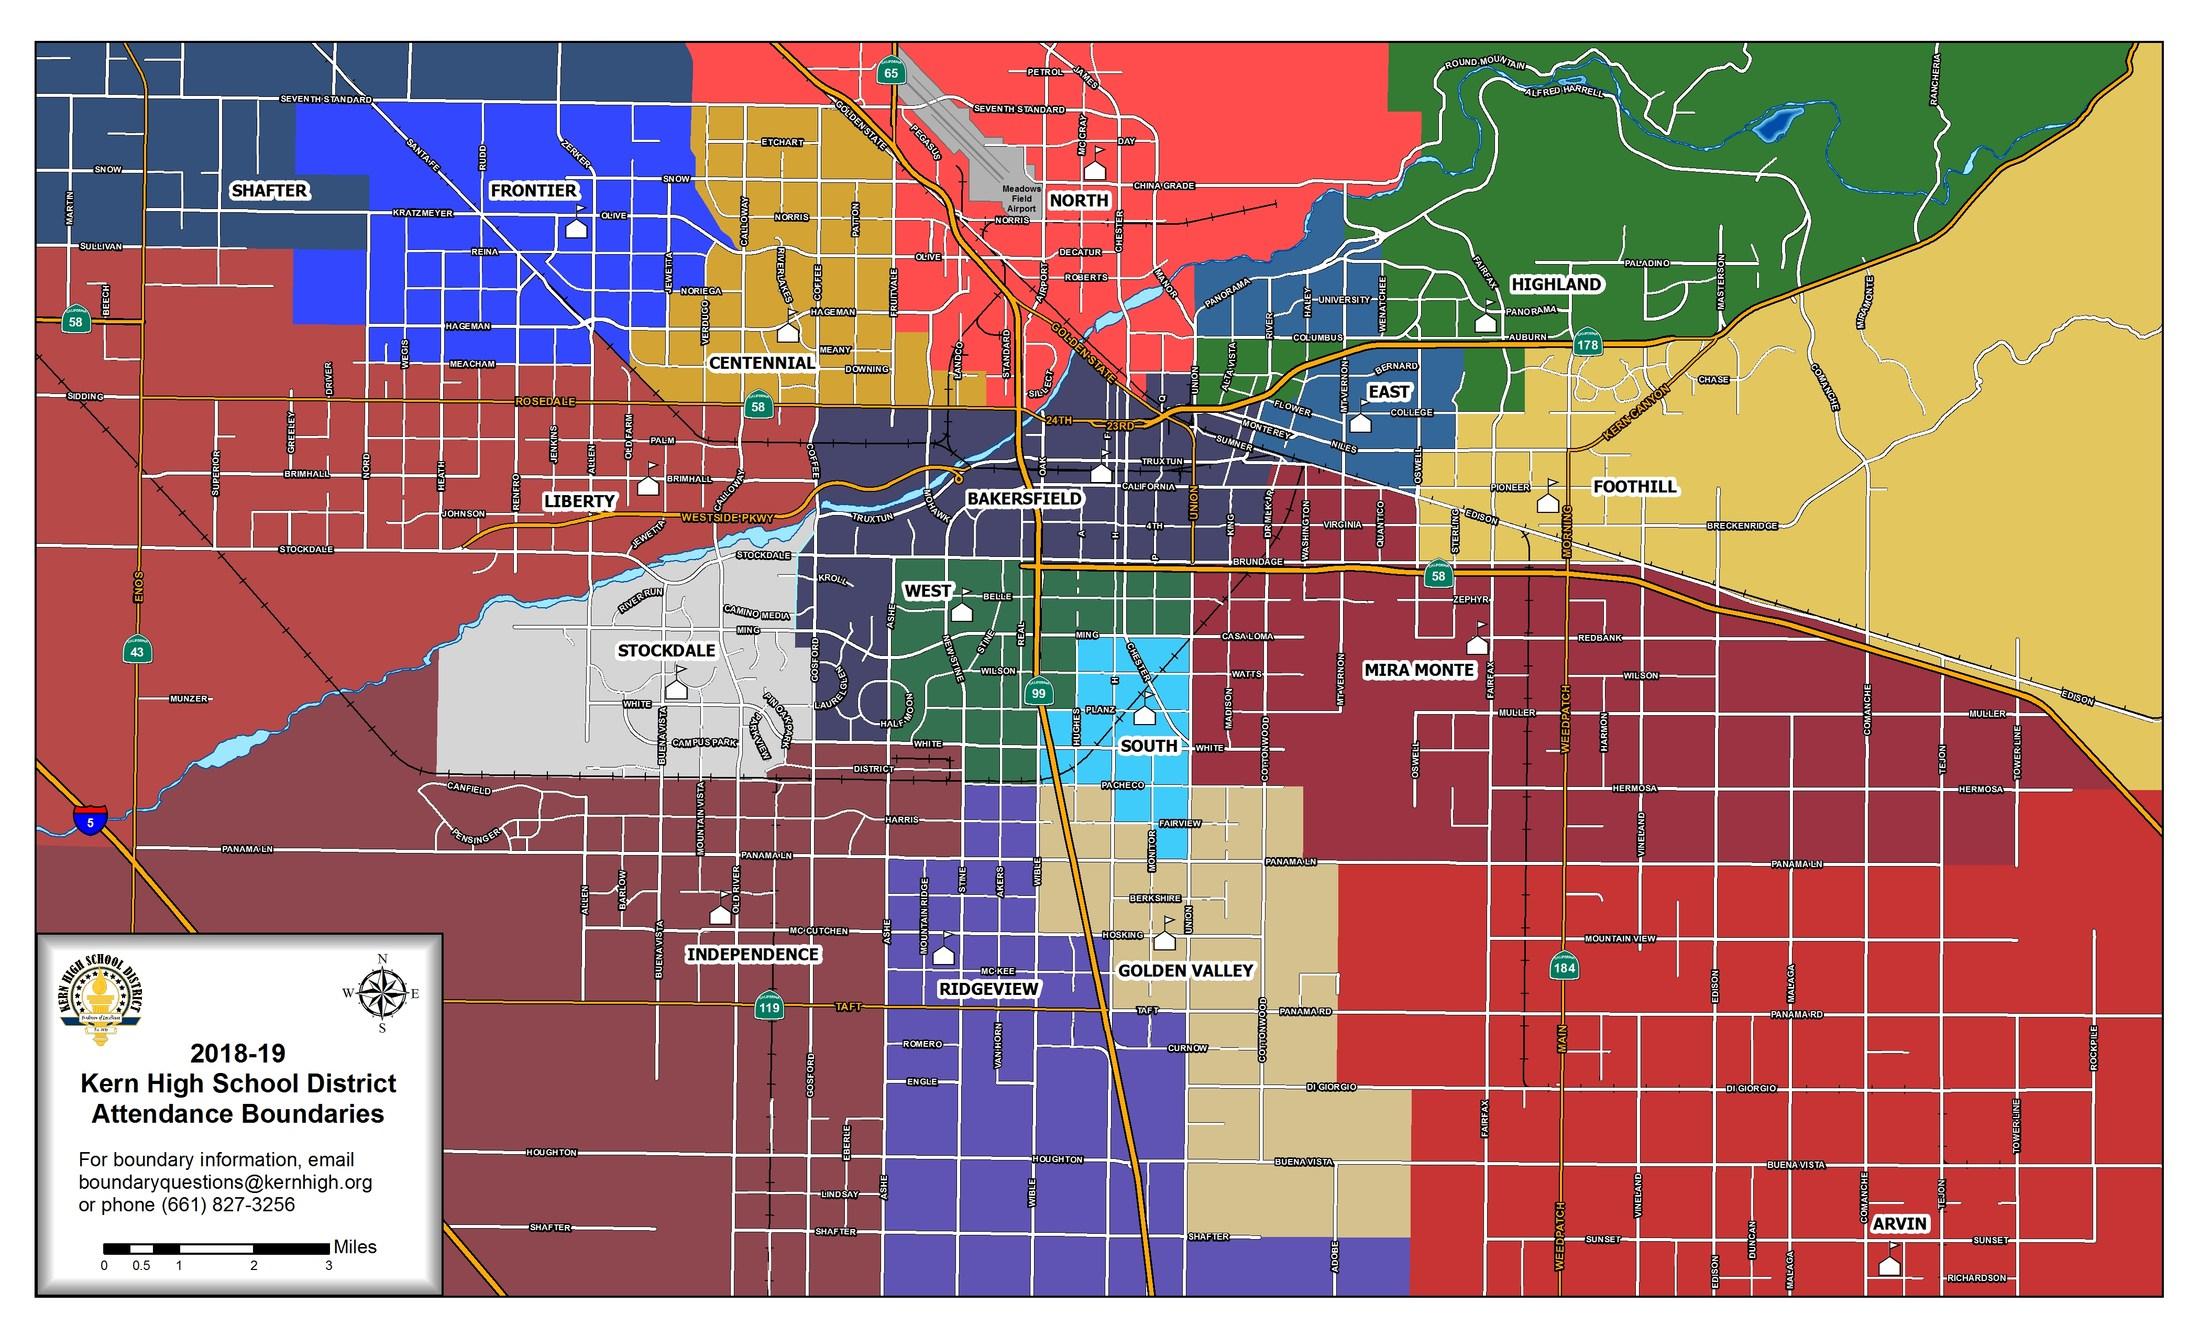 Bakersfield Ca Zip Code Map Bakersfield Hotels Bakersfield Hotel